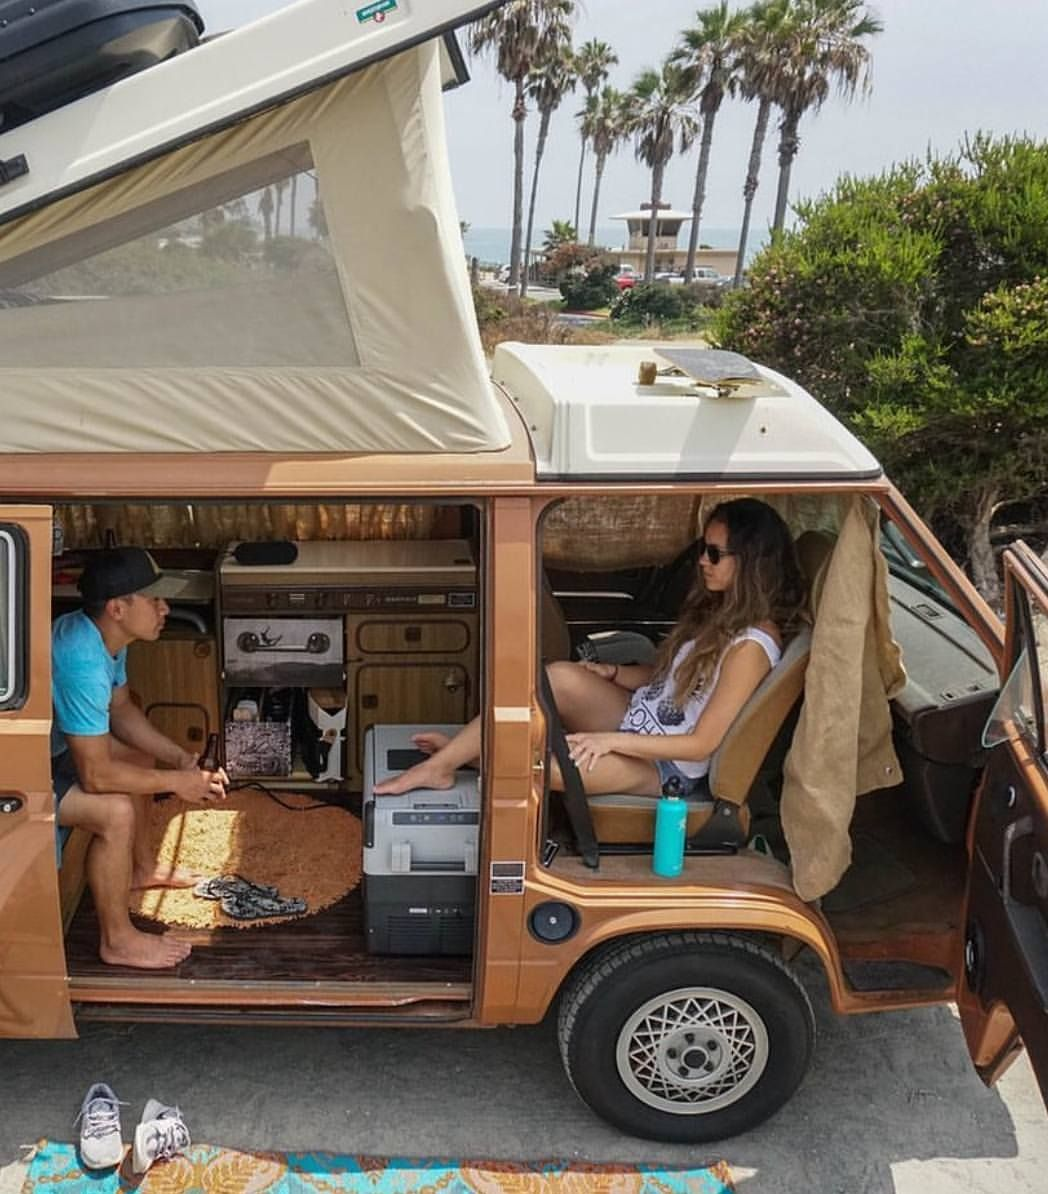 Pin by wayne Bidd on VW Stuff Van living, Van life